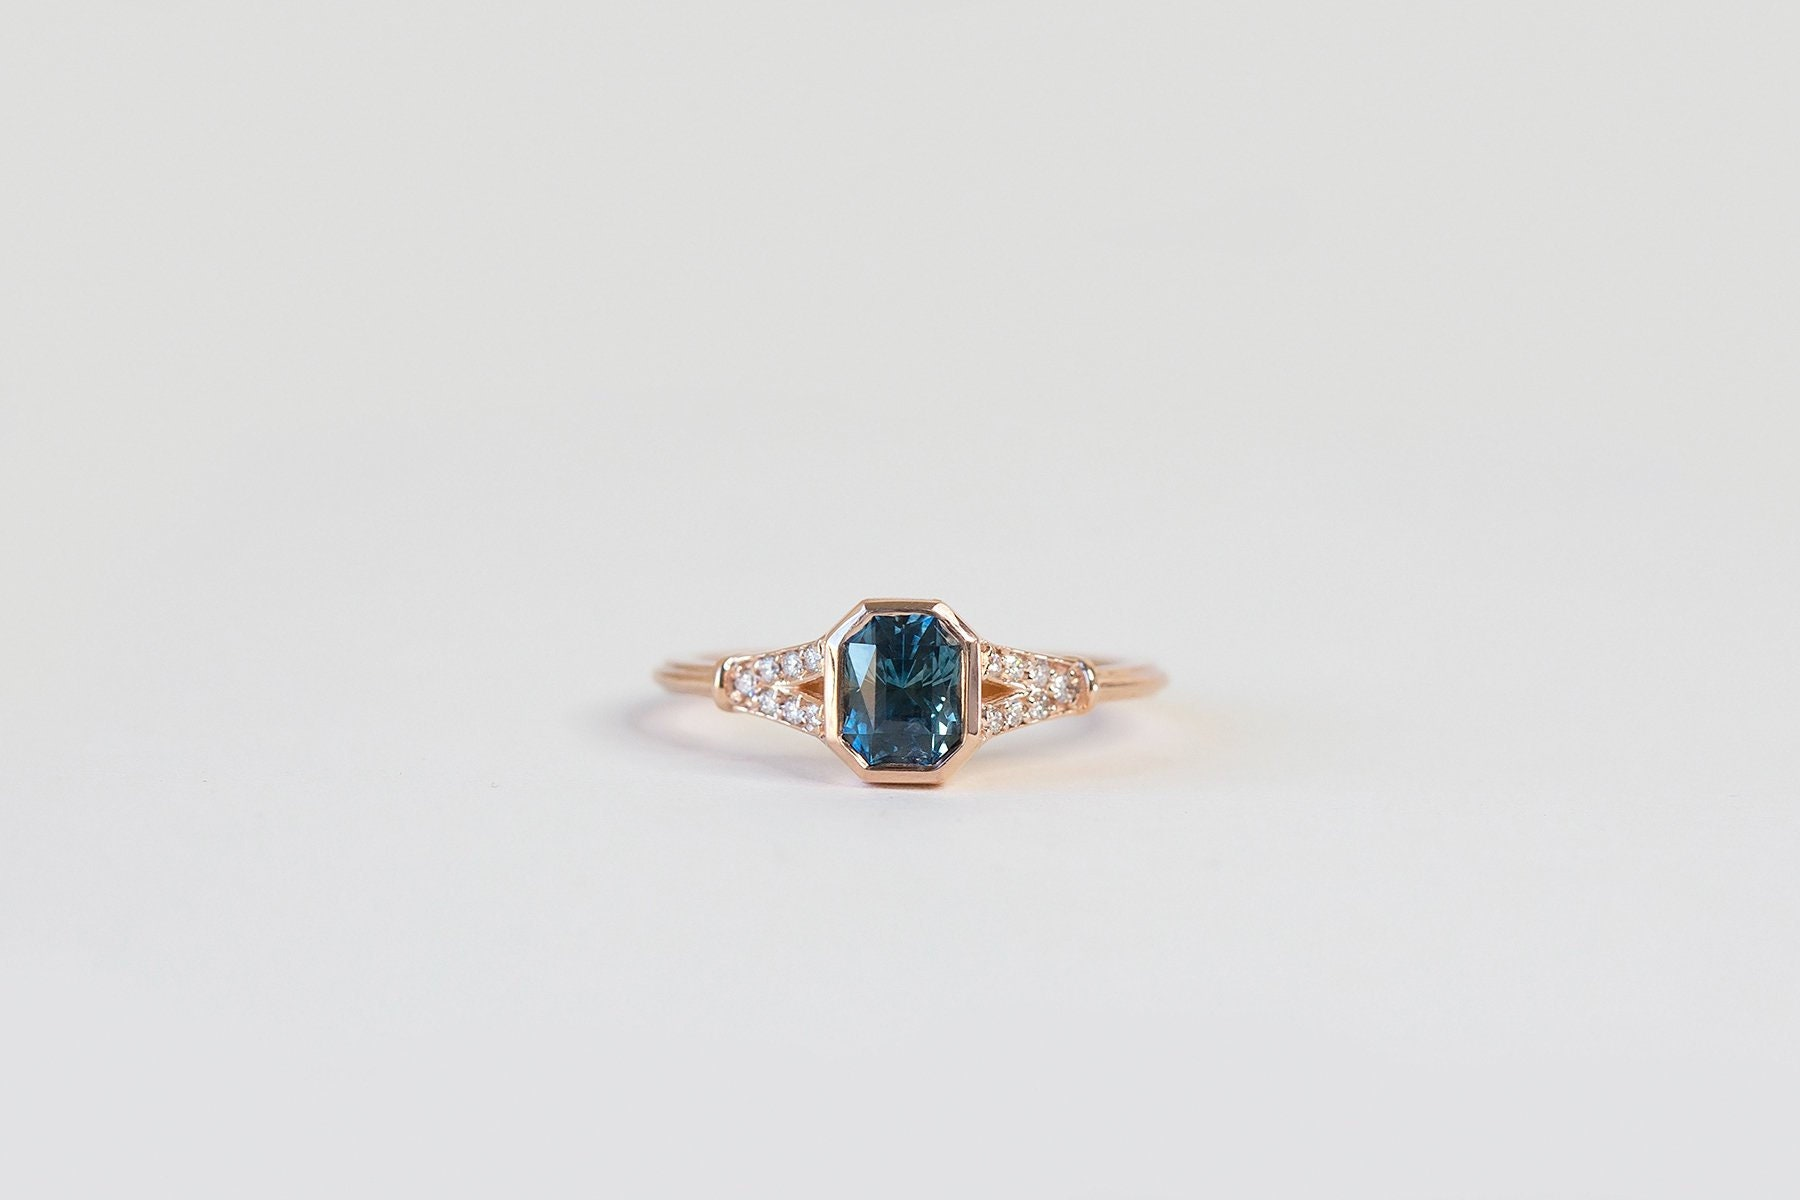 616d605ea Radiant Teal Montana Sapphire Art Deco Engagement Ring Bezel | Etsy